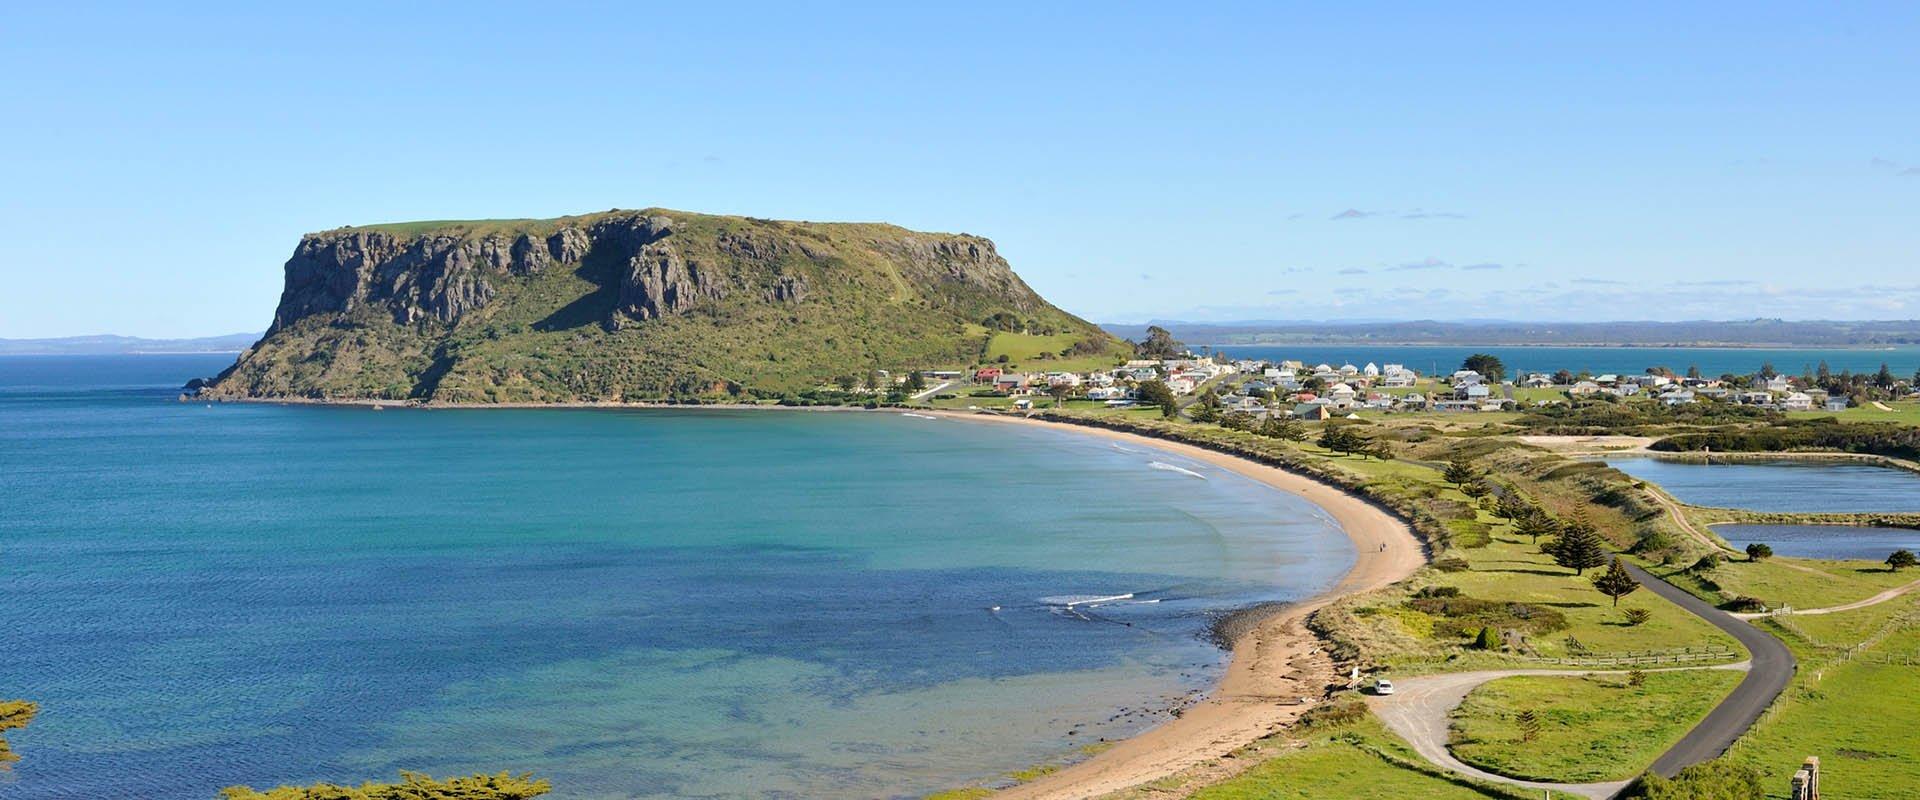 public holidays 2019 tasmania